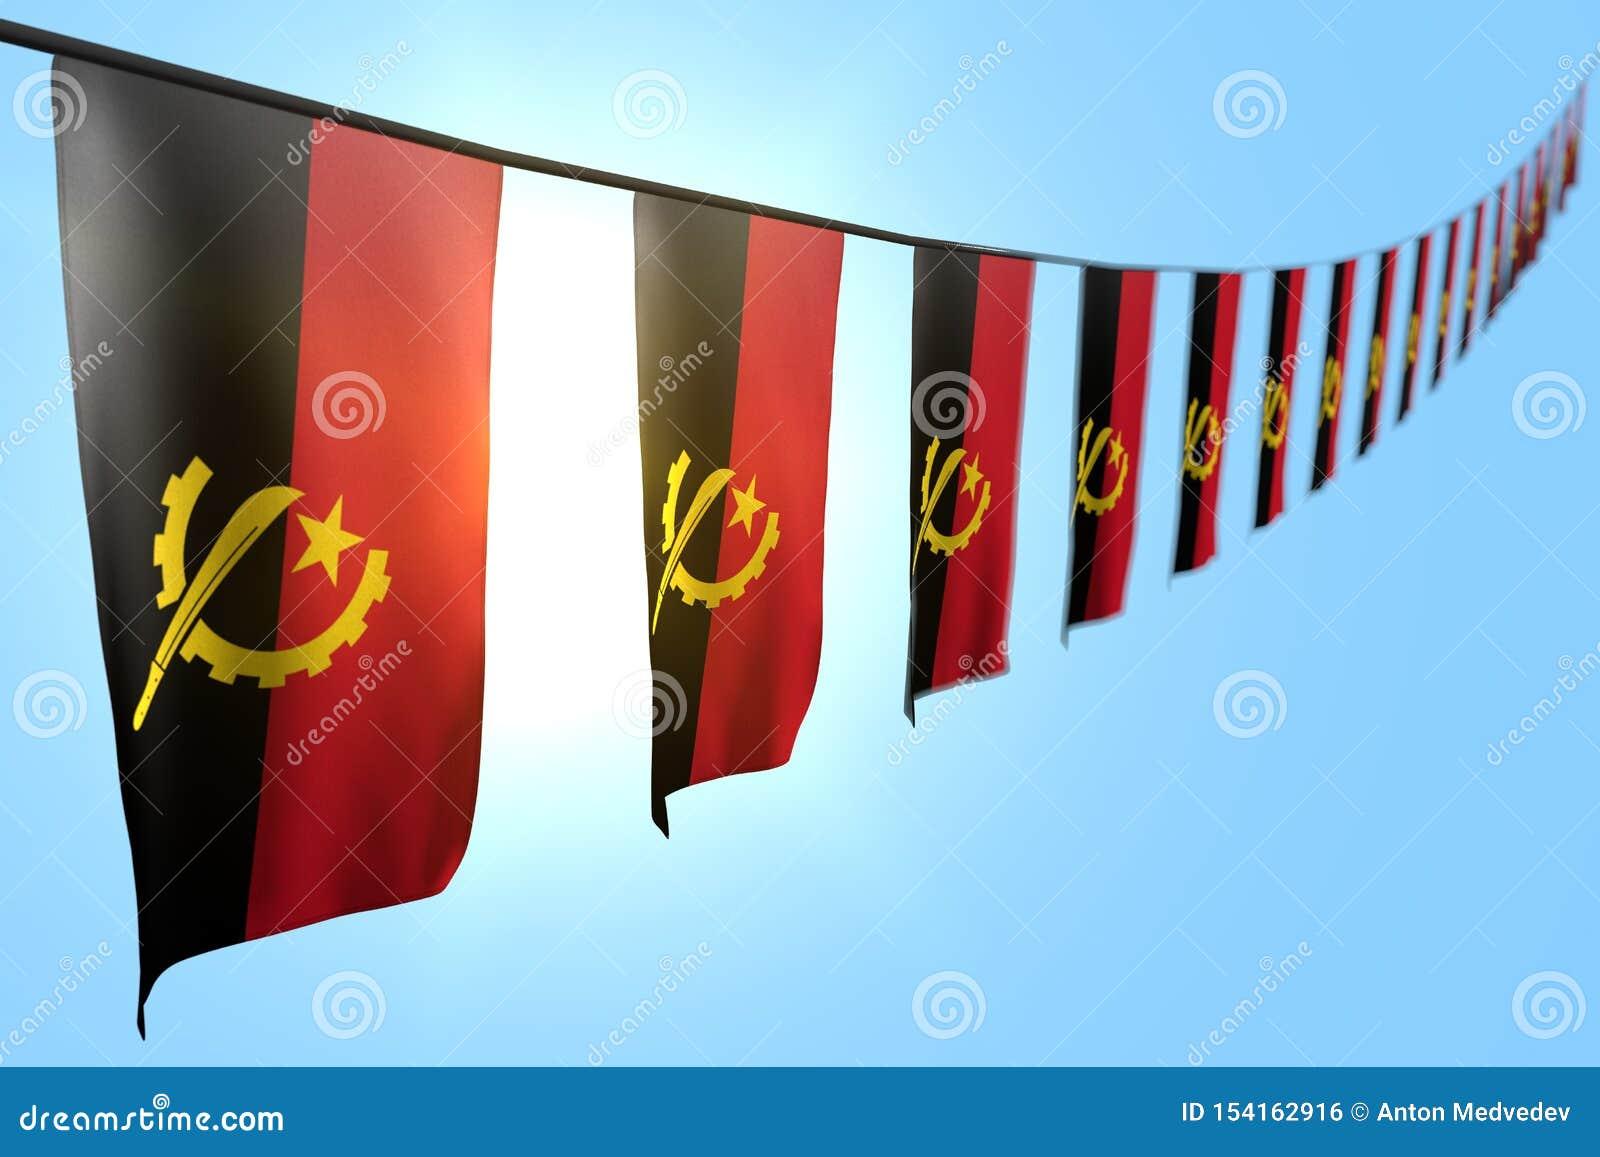 Cute Feast Flag 3d Illustration - Many Angola Flags Or